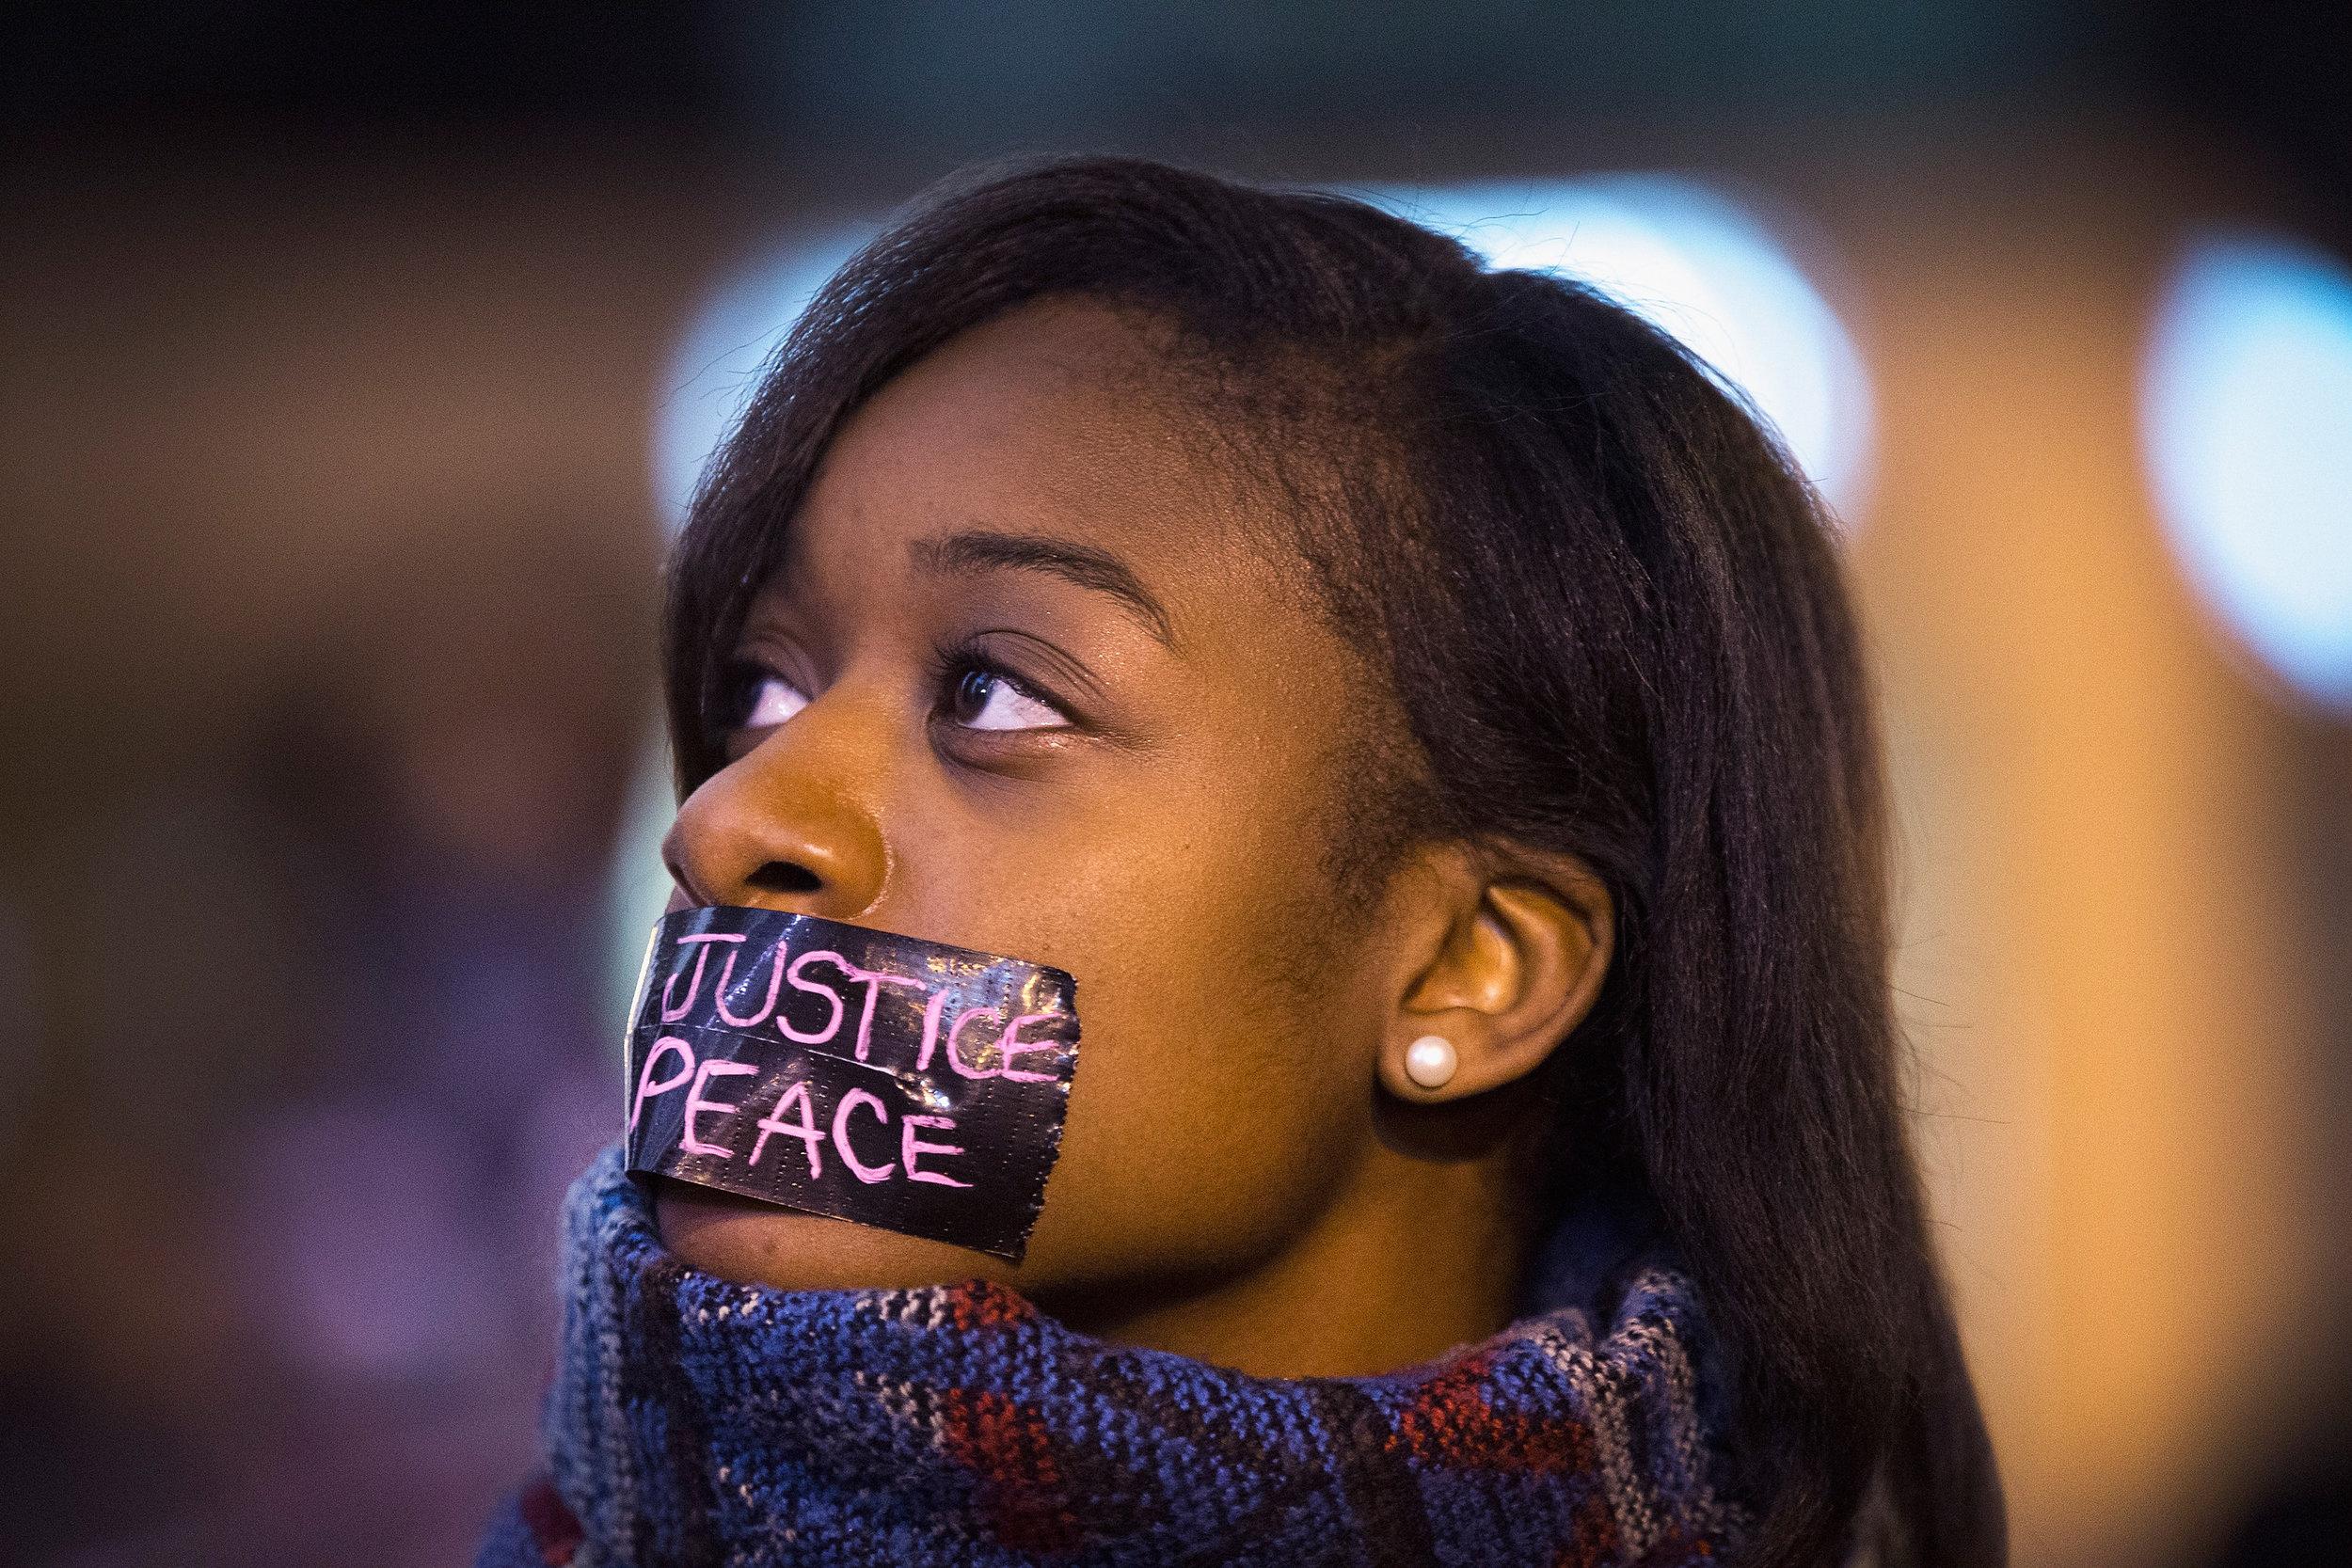 justice peace photo.jpg